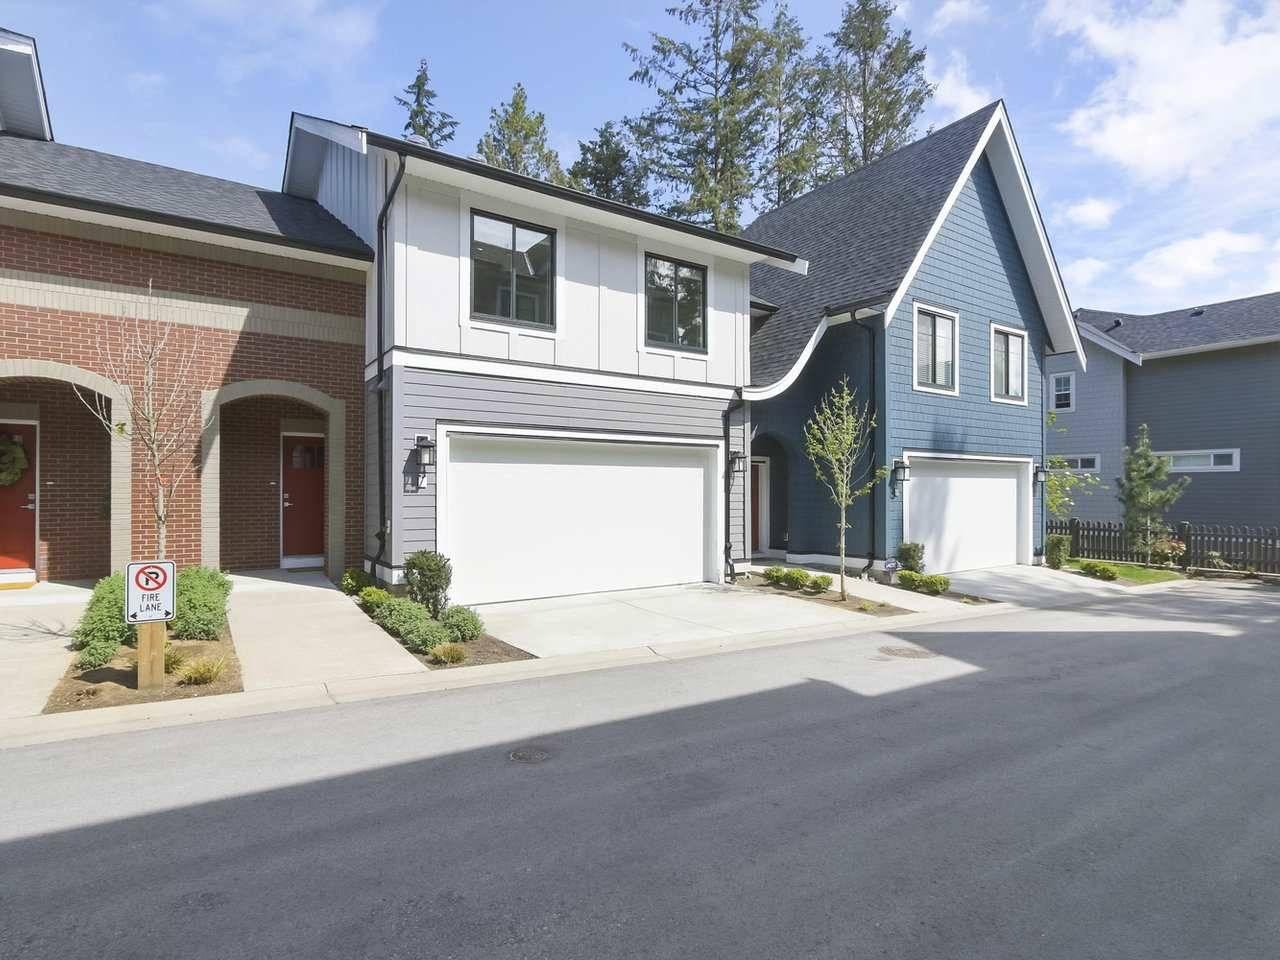 Buliding: 15677 28 Avenue, Surrey, BC